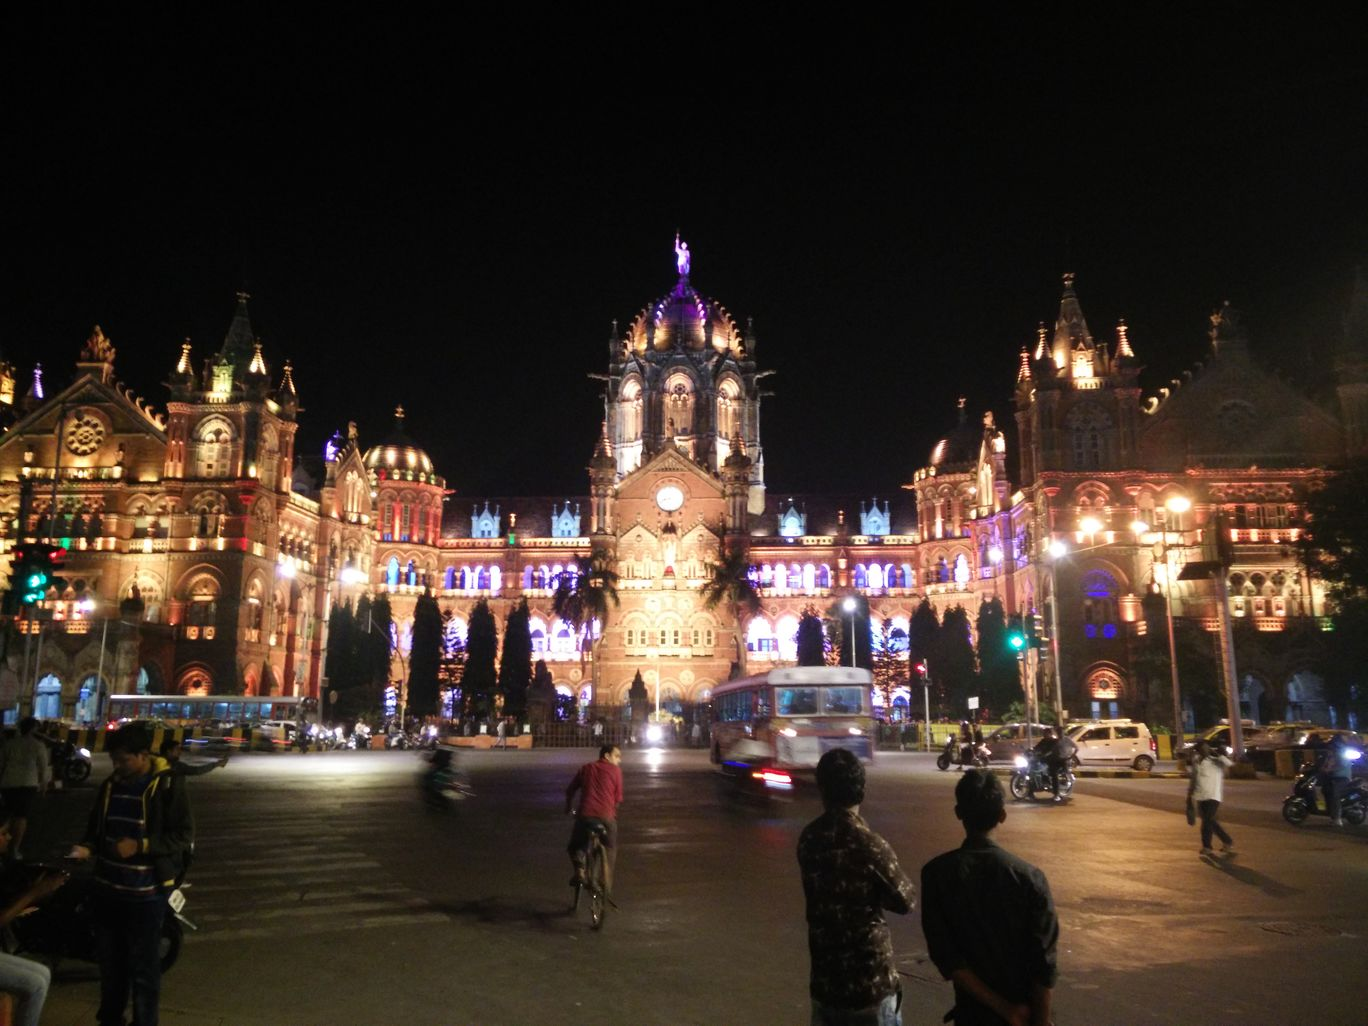 Photo of Chatrapati Shivaji Terminals S.T Bus Stop By Hemanth Varma